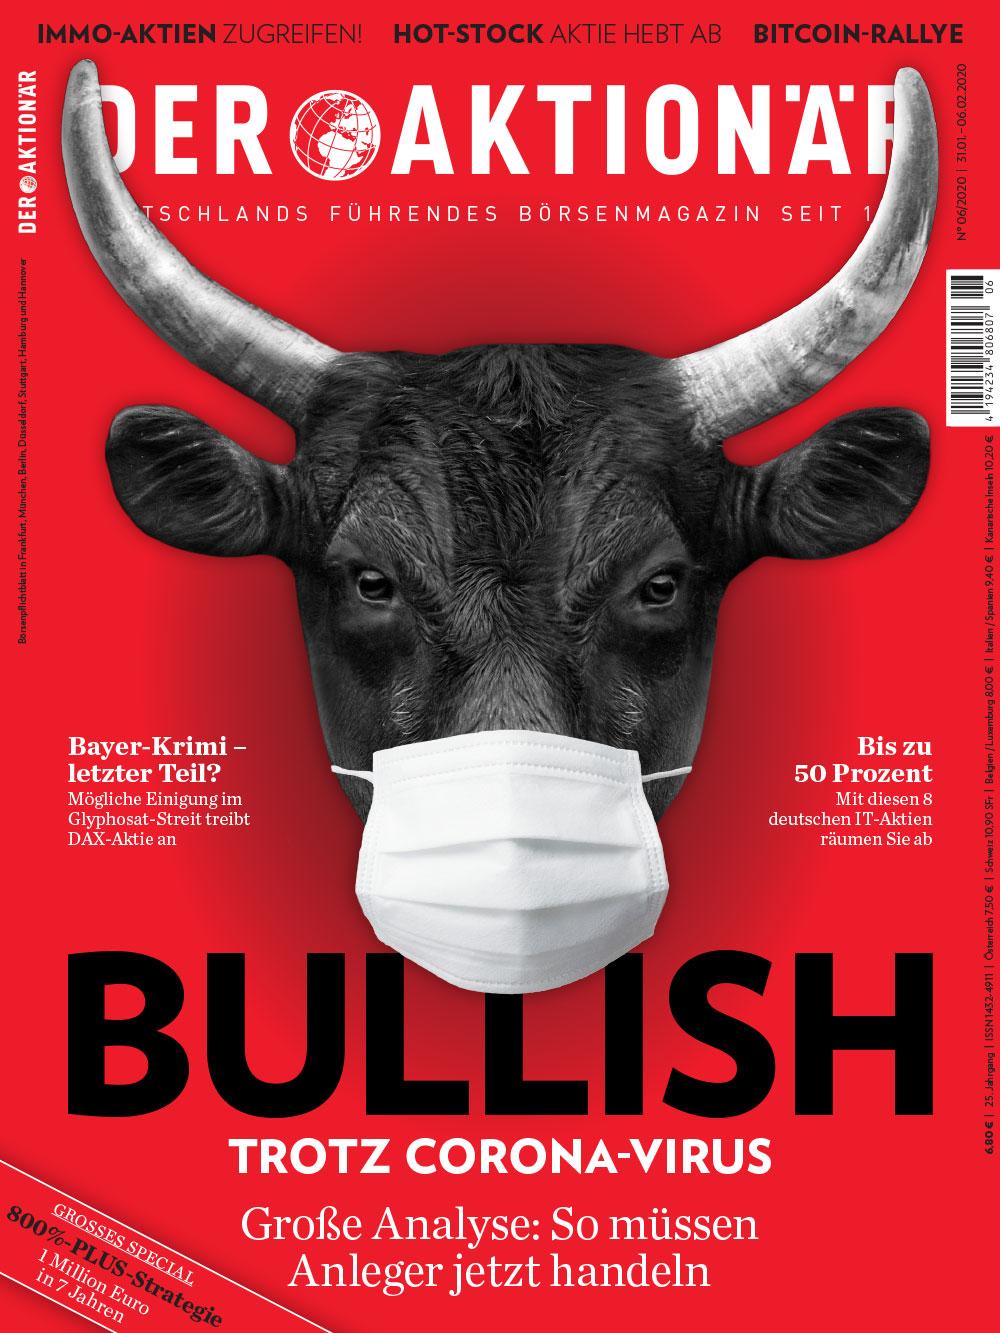 DER AKTIONÄR Februar 2020: Bullish – Trotz Corona-Virus